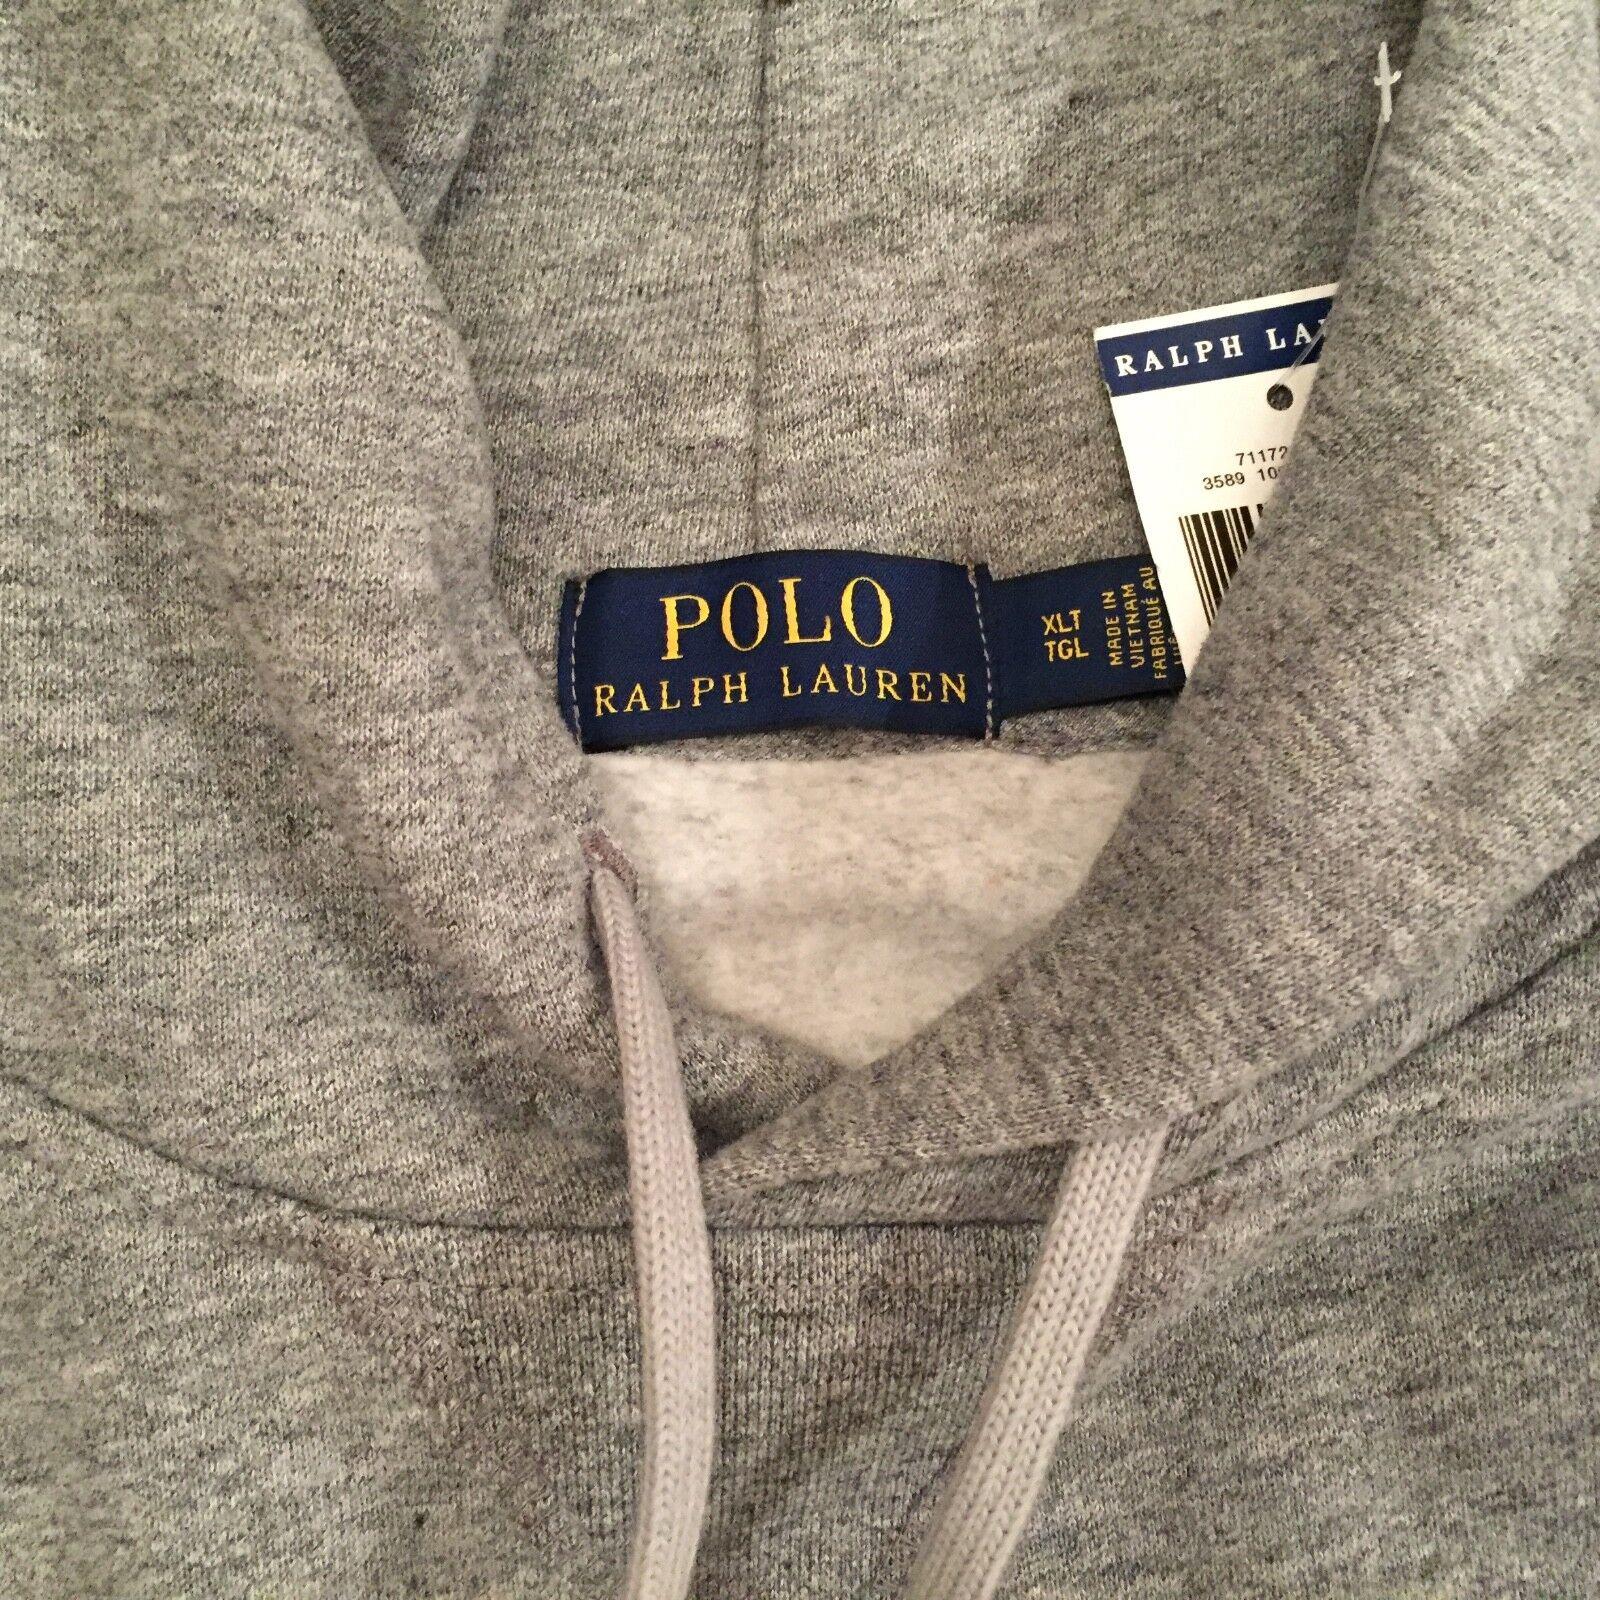 Polo Ralph Lauren Herren Polo Bear Soccer Bear Hoodie weiß oder grau Big & Tall